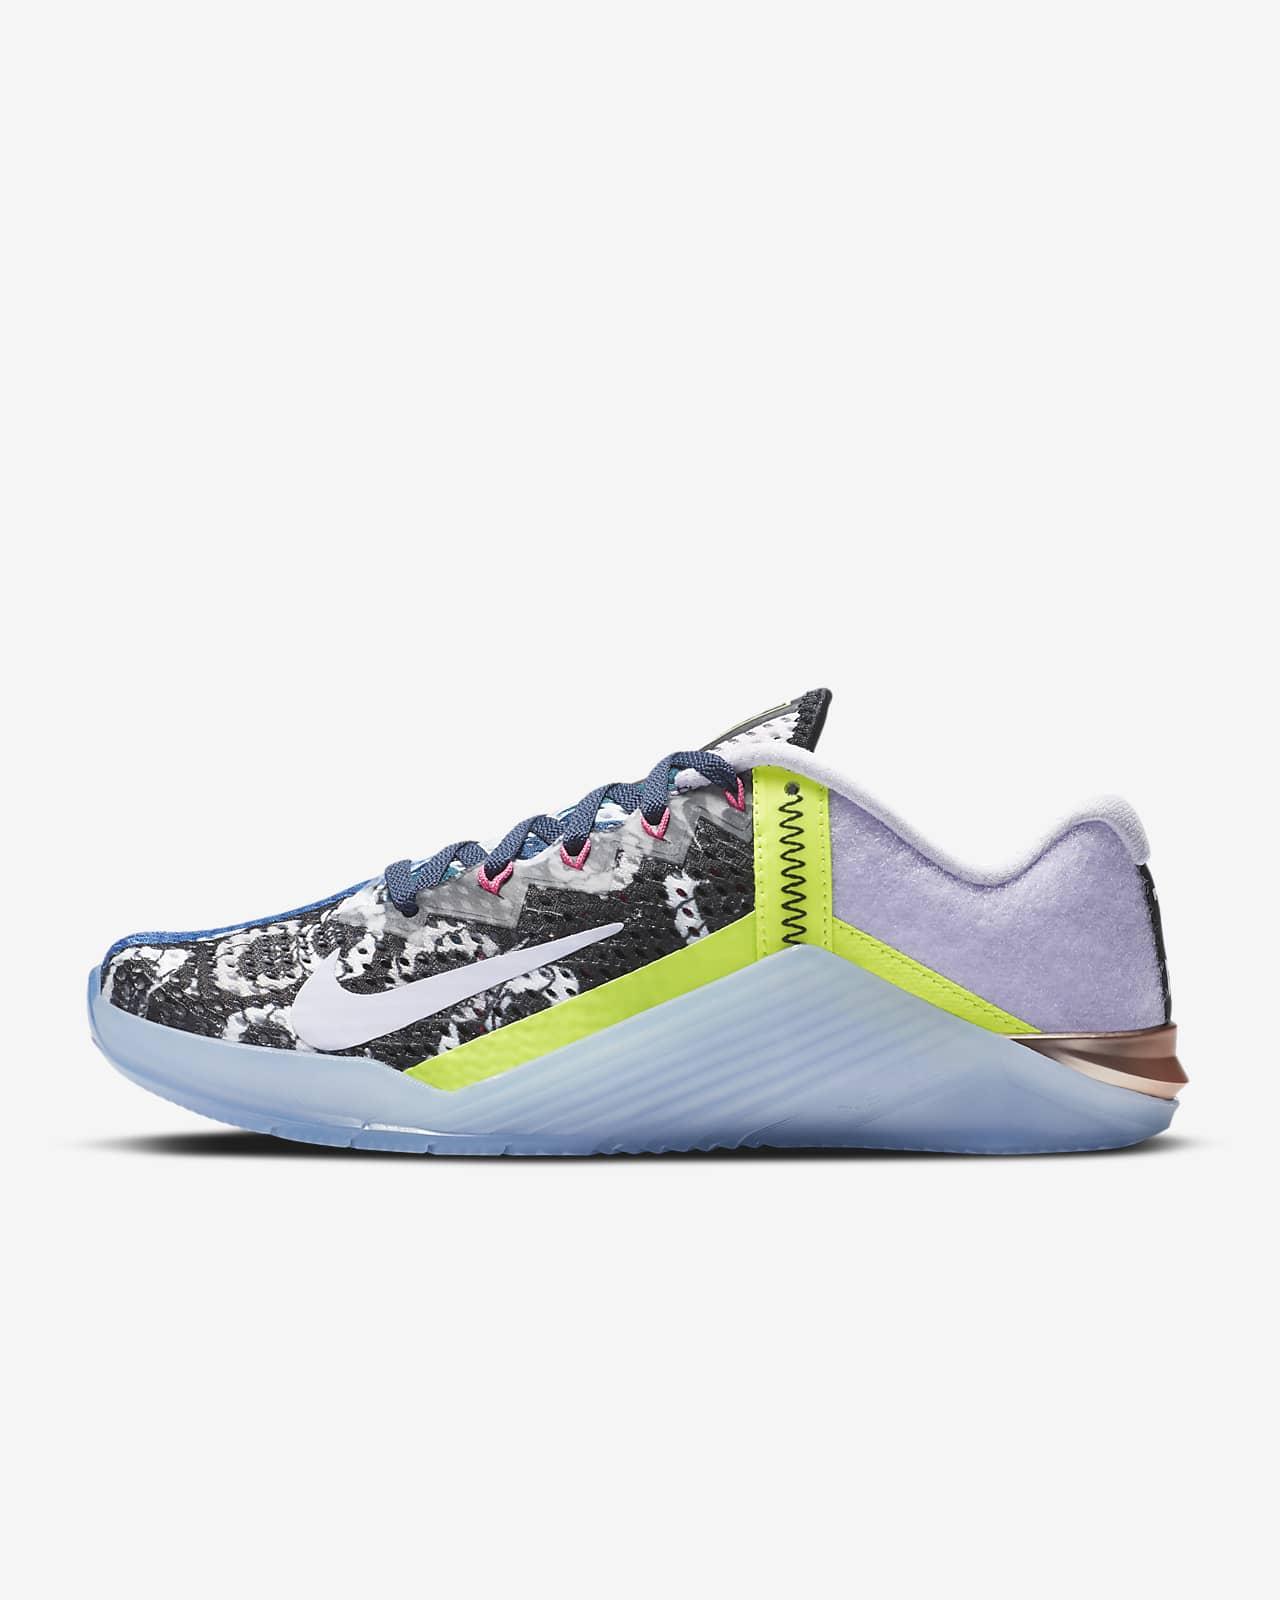 Sapatilhas de treino Nike Metcon 6 X para mulher